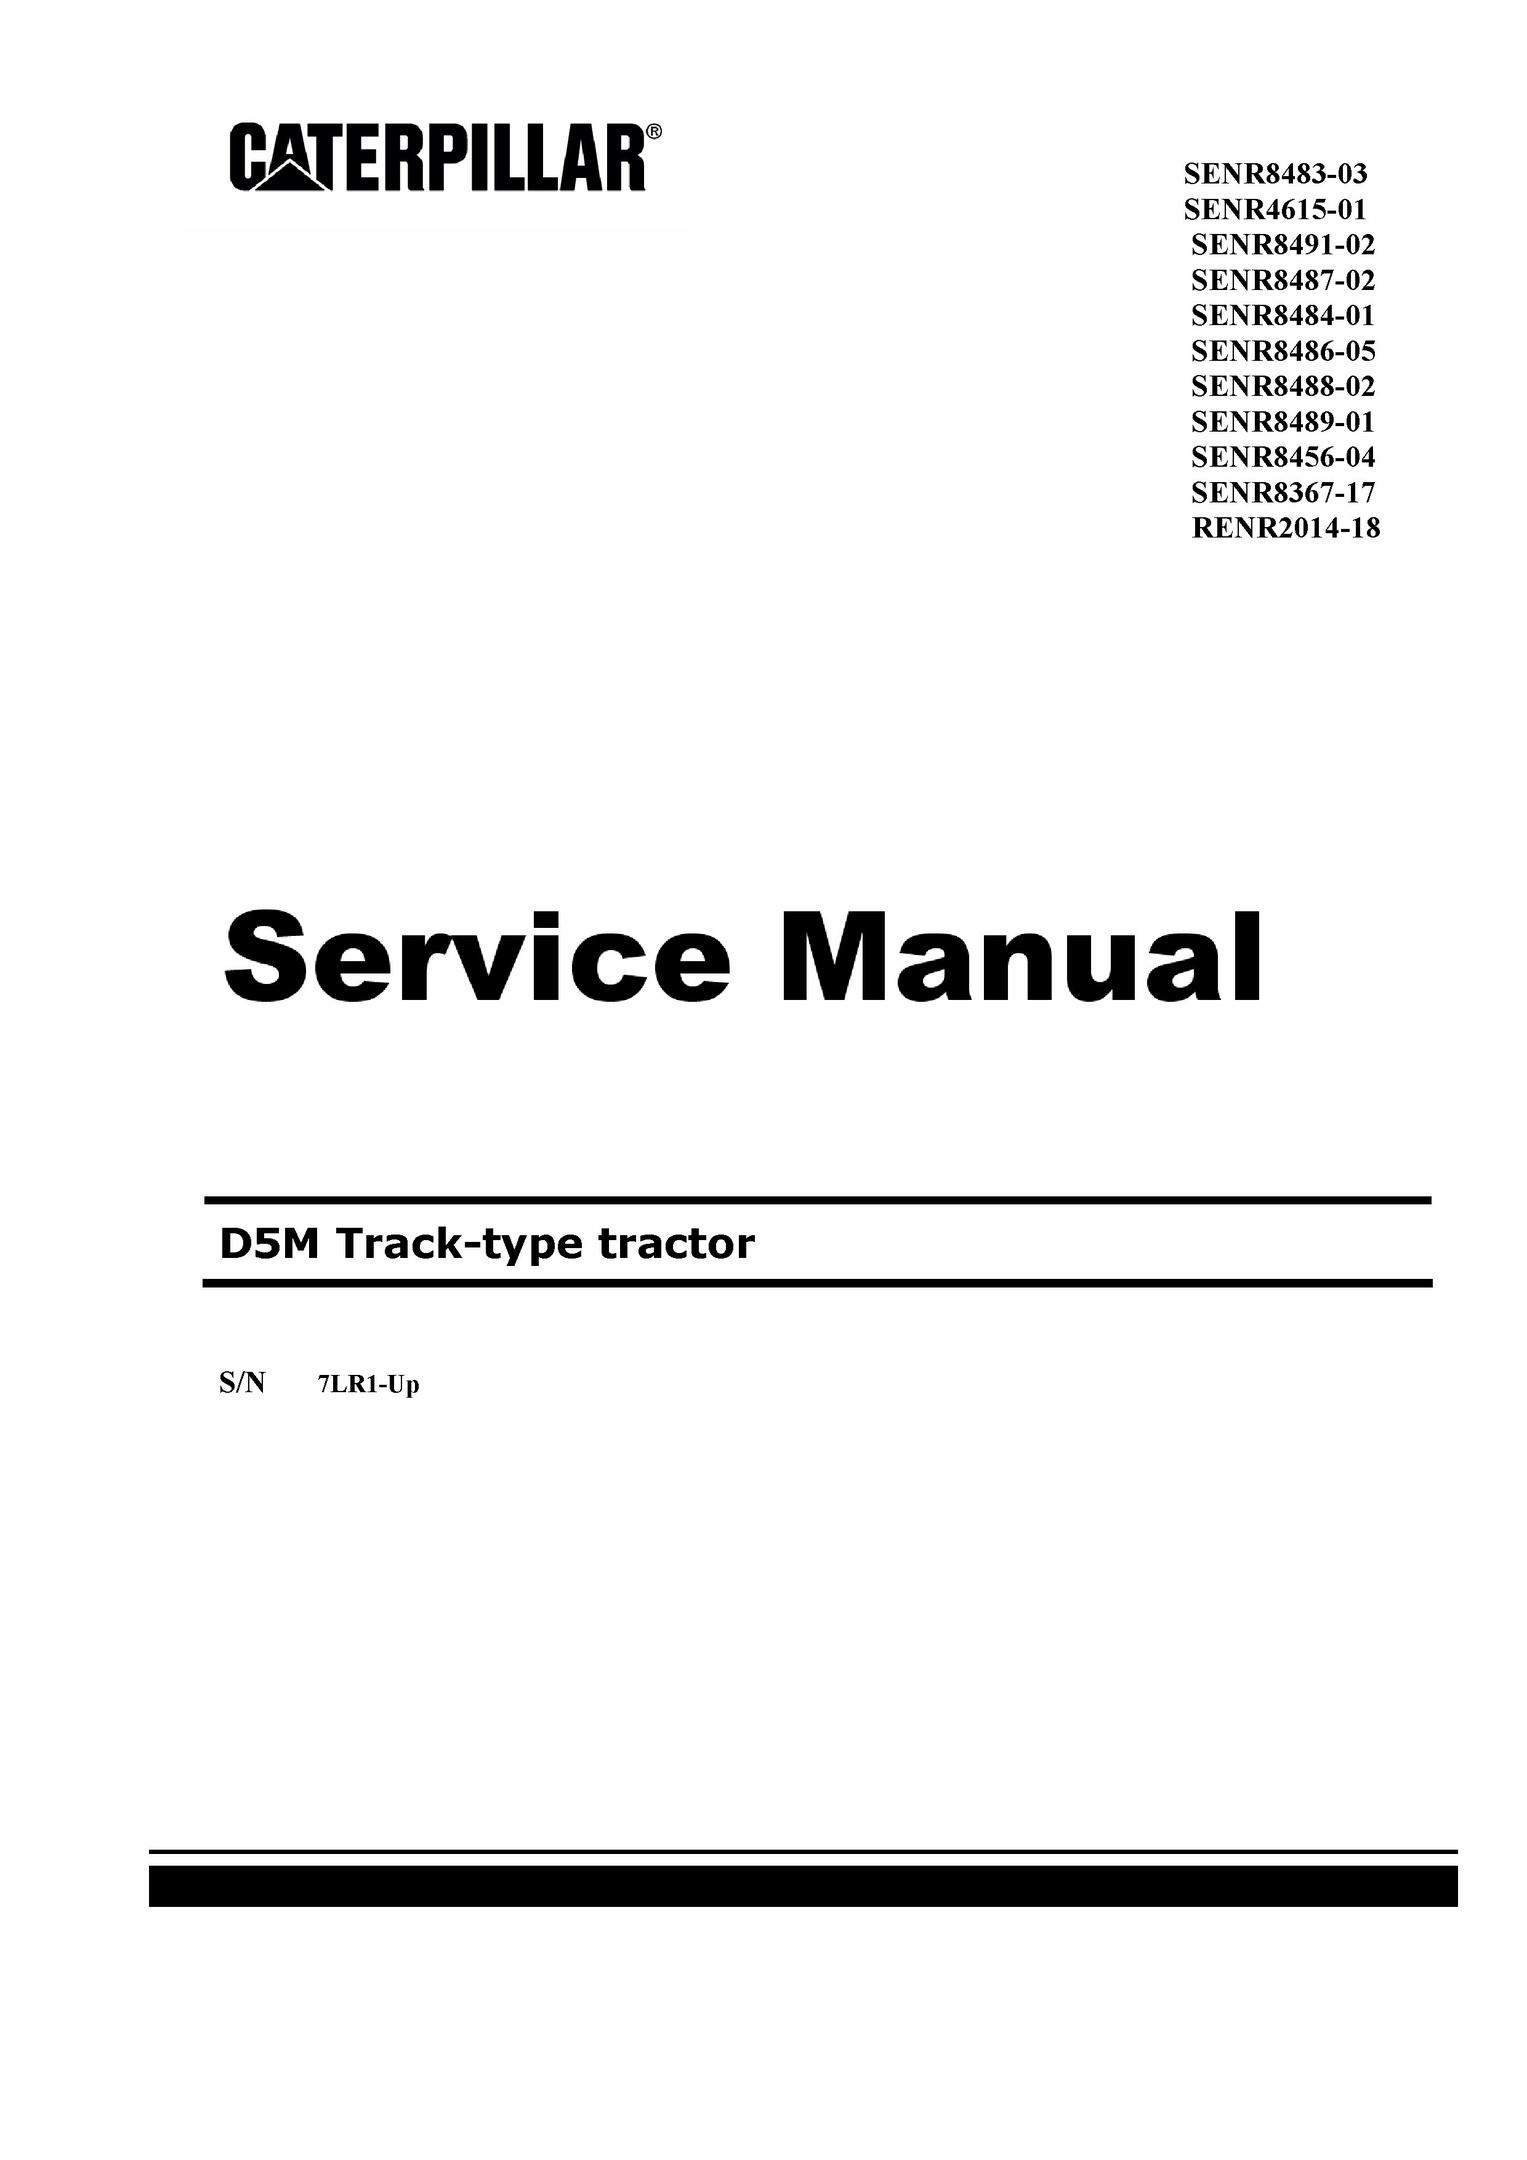 ... hp computer service manual Array - cat 3406 service repair manual ebook  rh cat 3406 service repair manual ebook angelayu